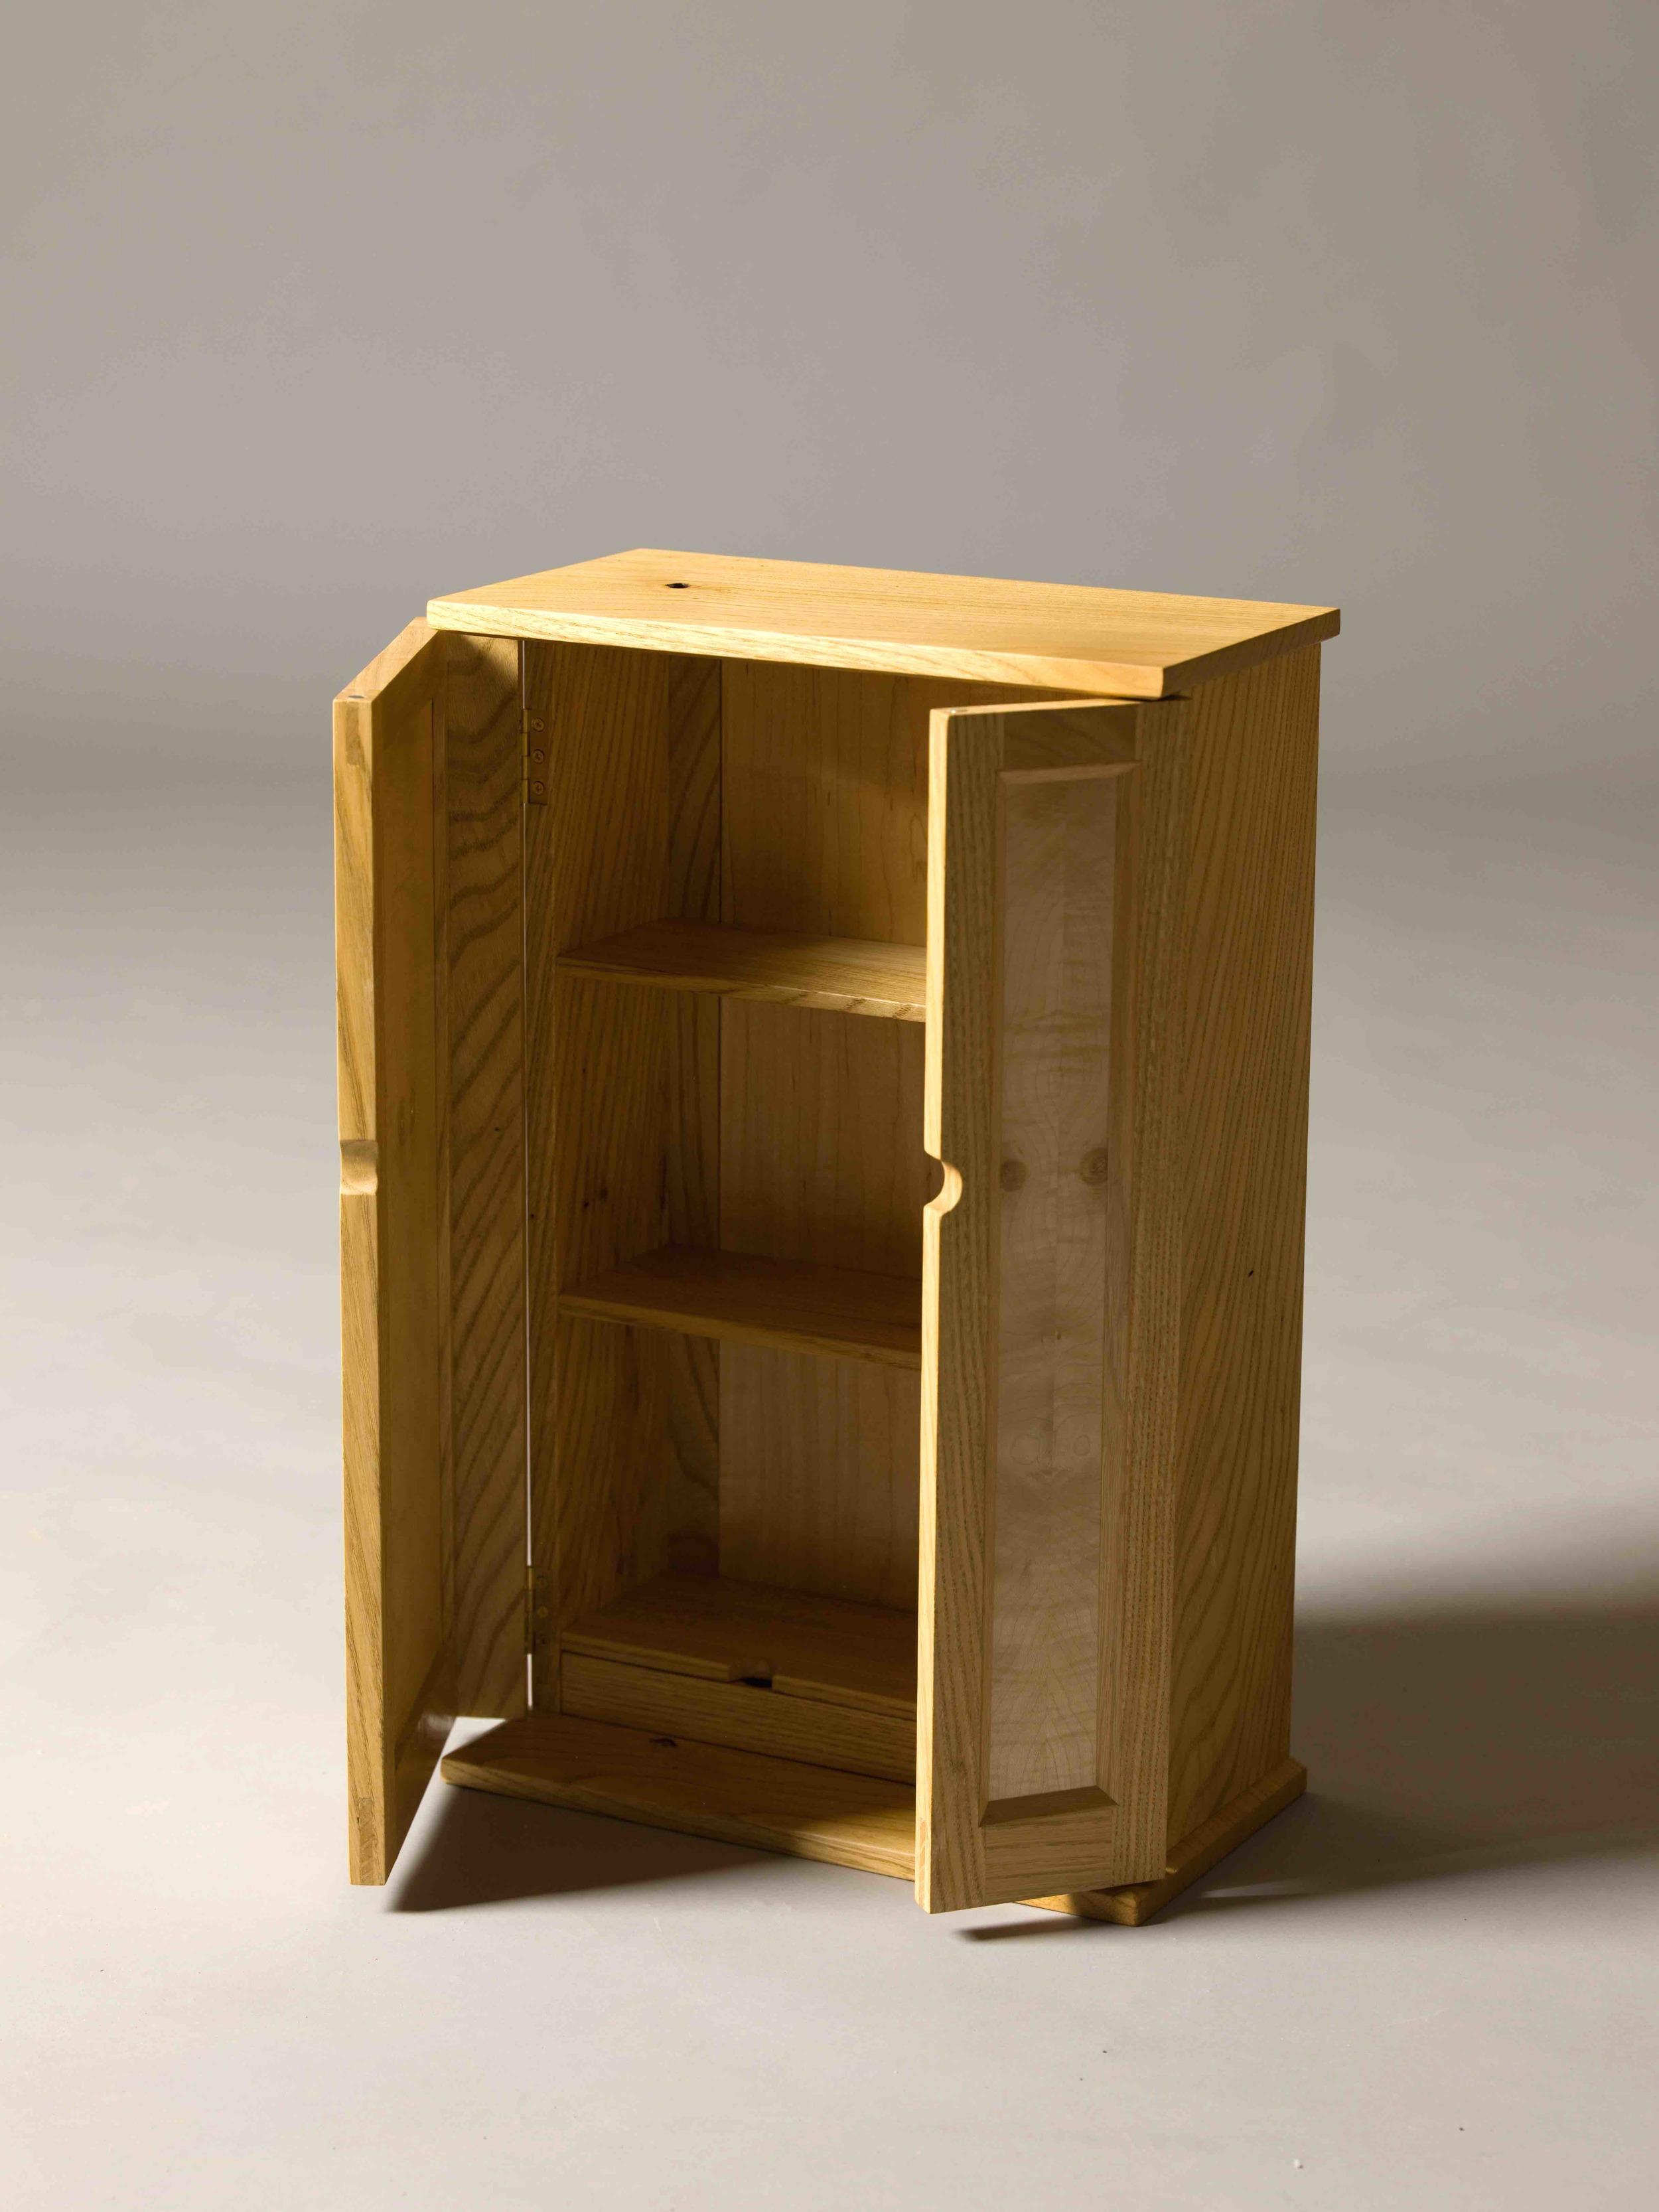 Chestnut Cabinet3 copy.jpg